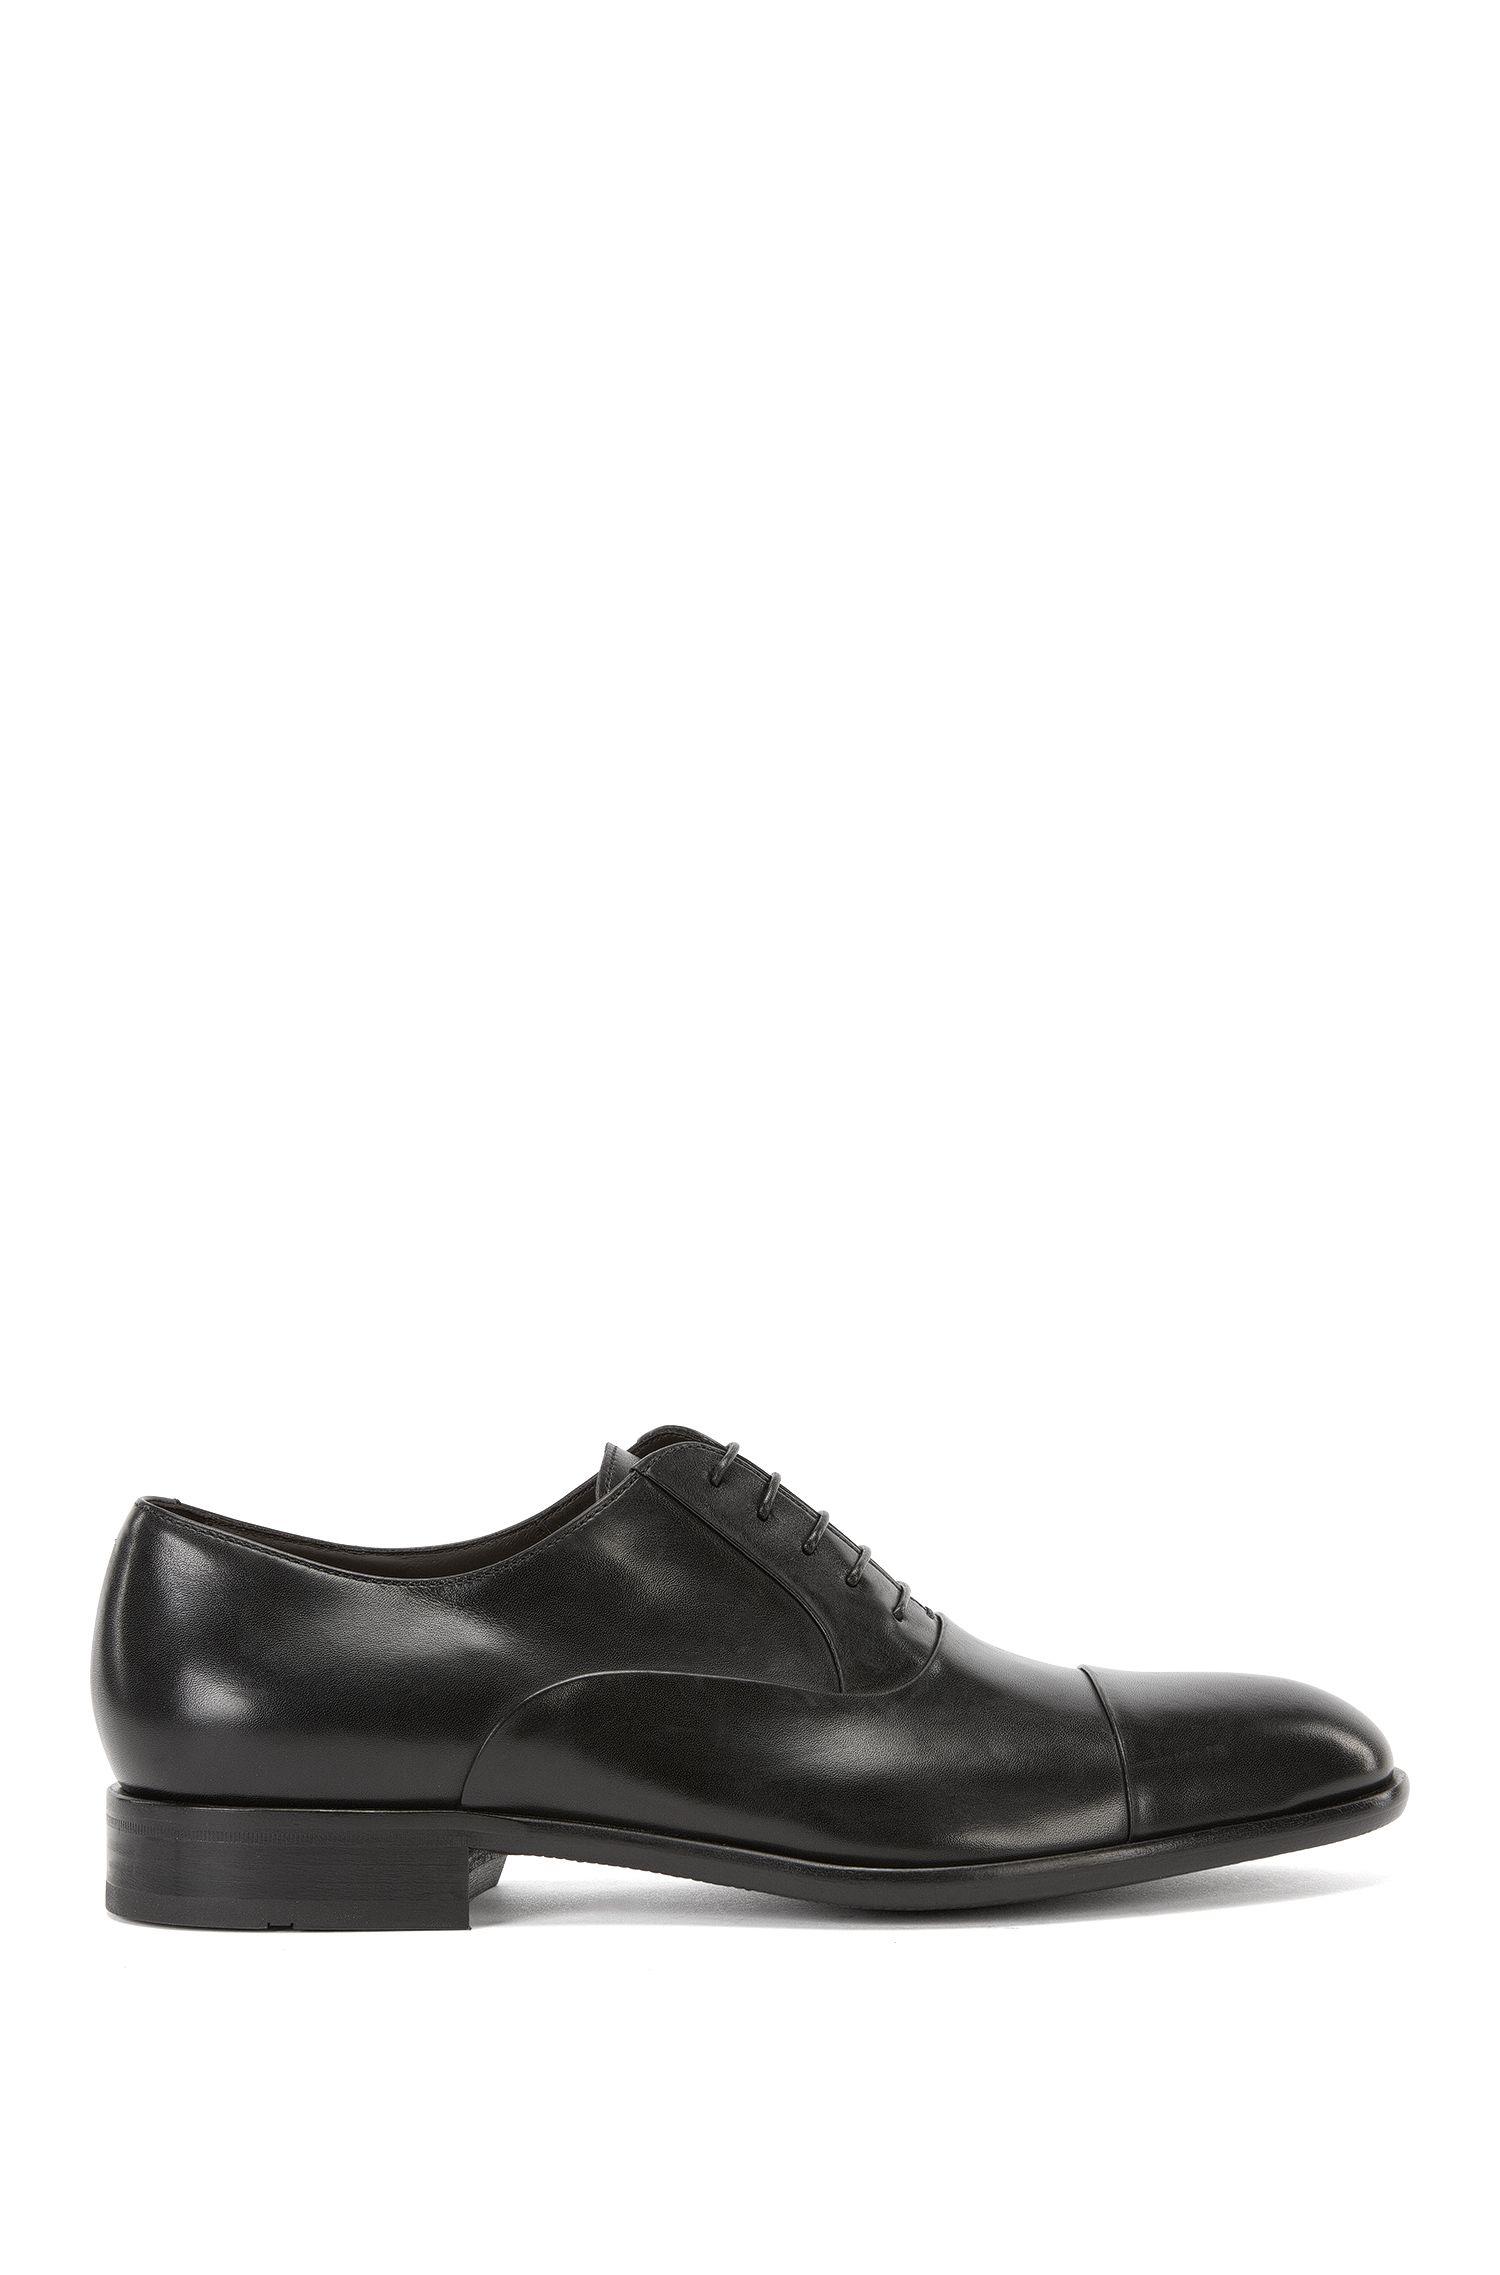 Oxford Dress Shoe | Bristol Oxfr Ctst